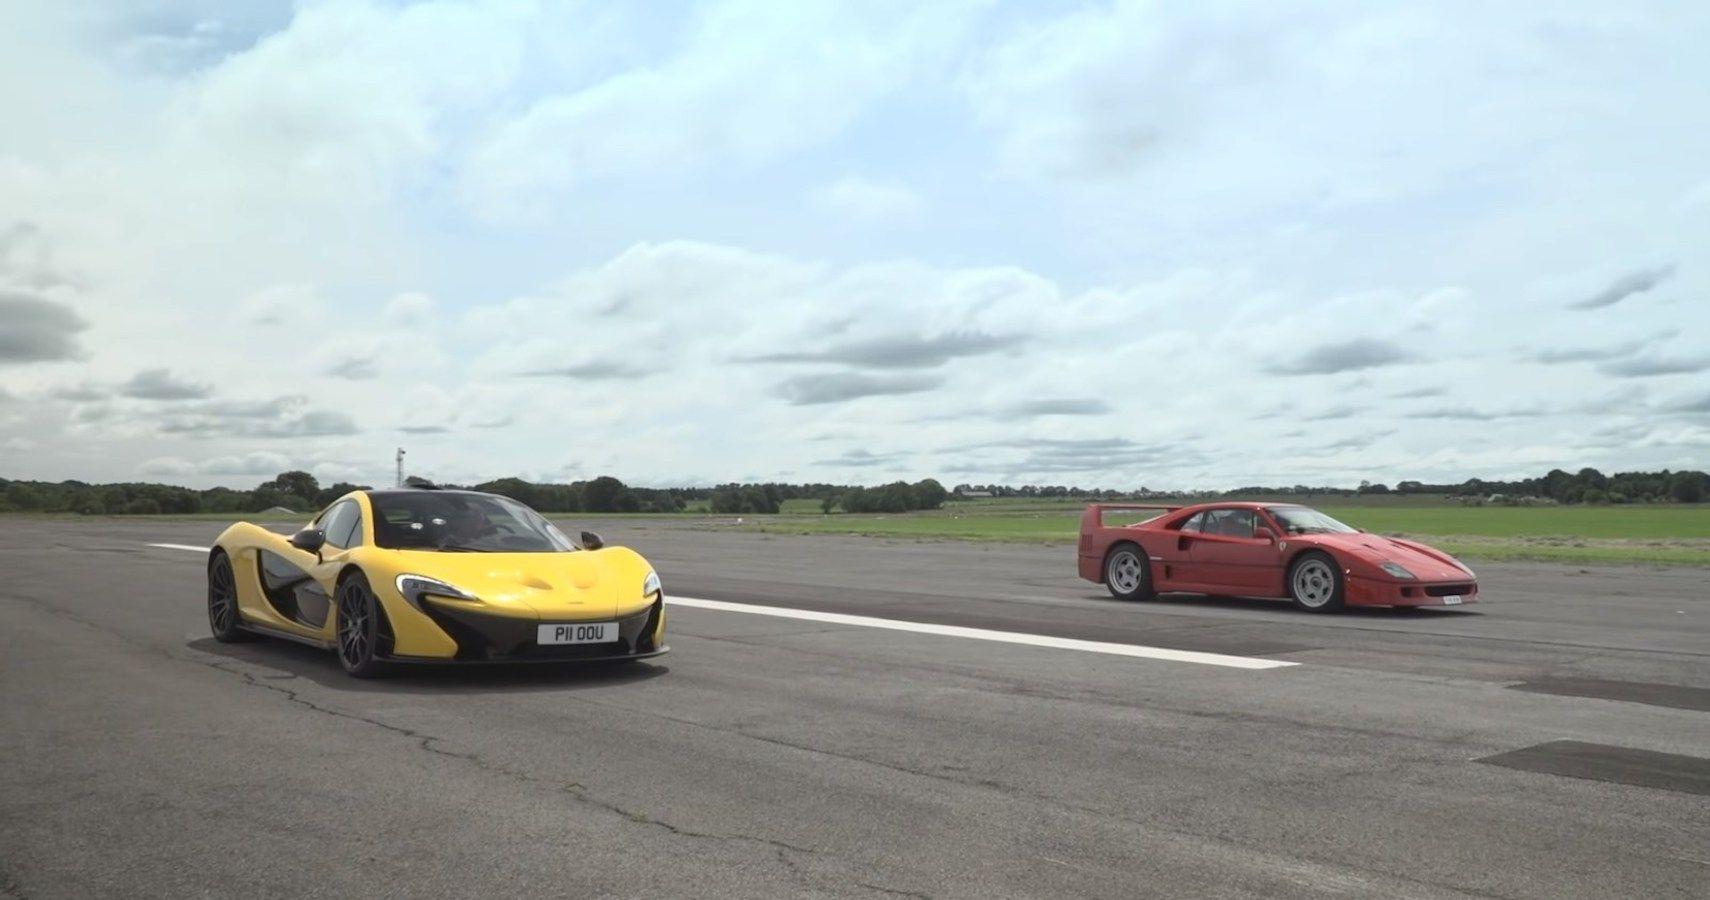 McLaren P1 Vs Ferrari F40 Drag Race Pits Two Legendary Supercars Against Each Other